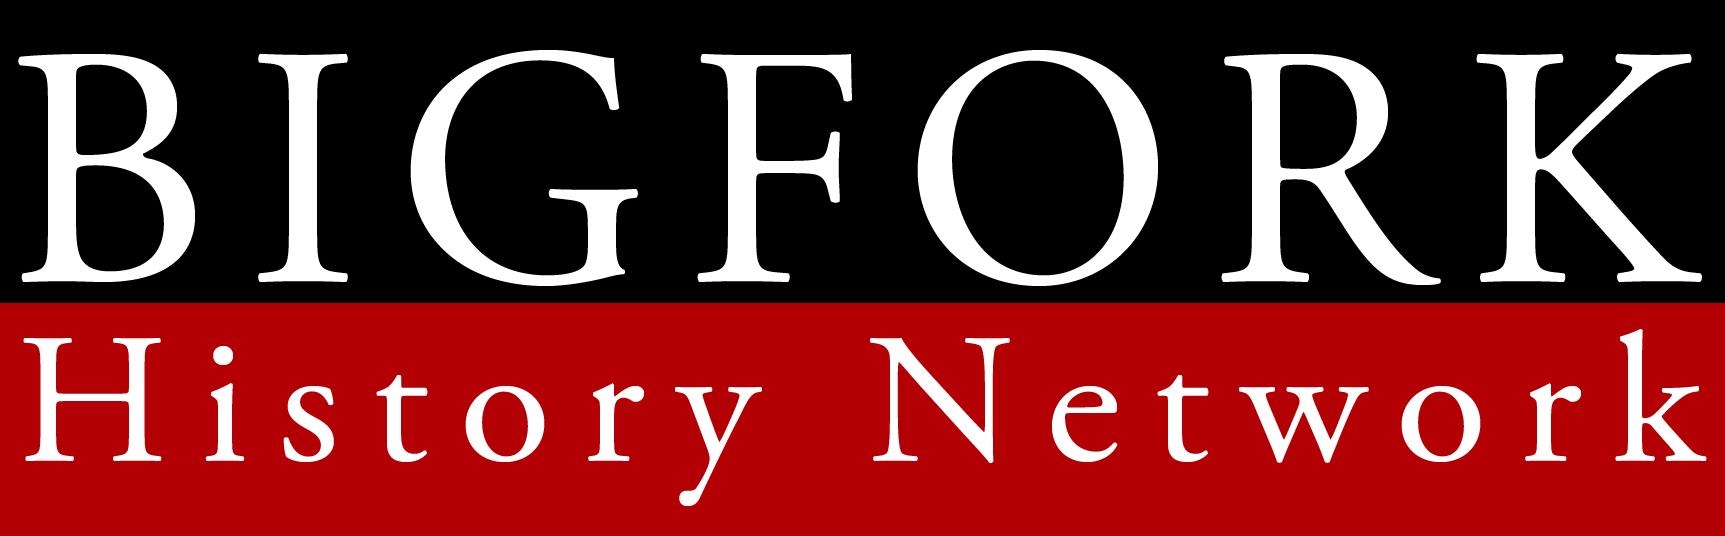 Bigfork History Network